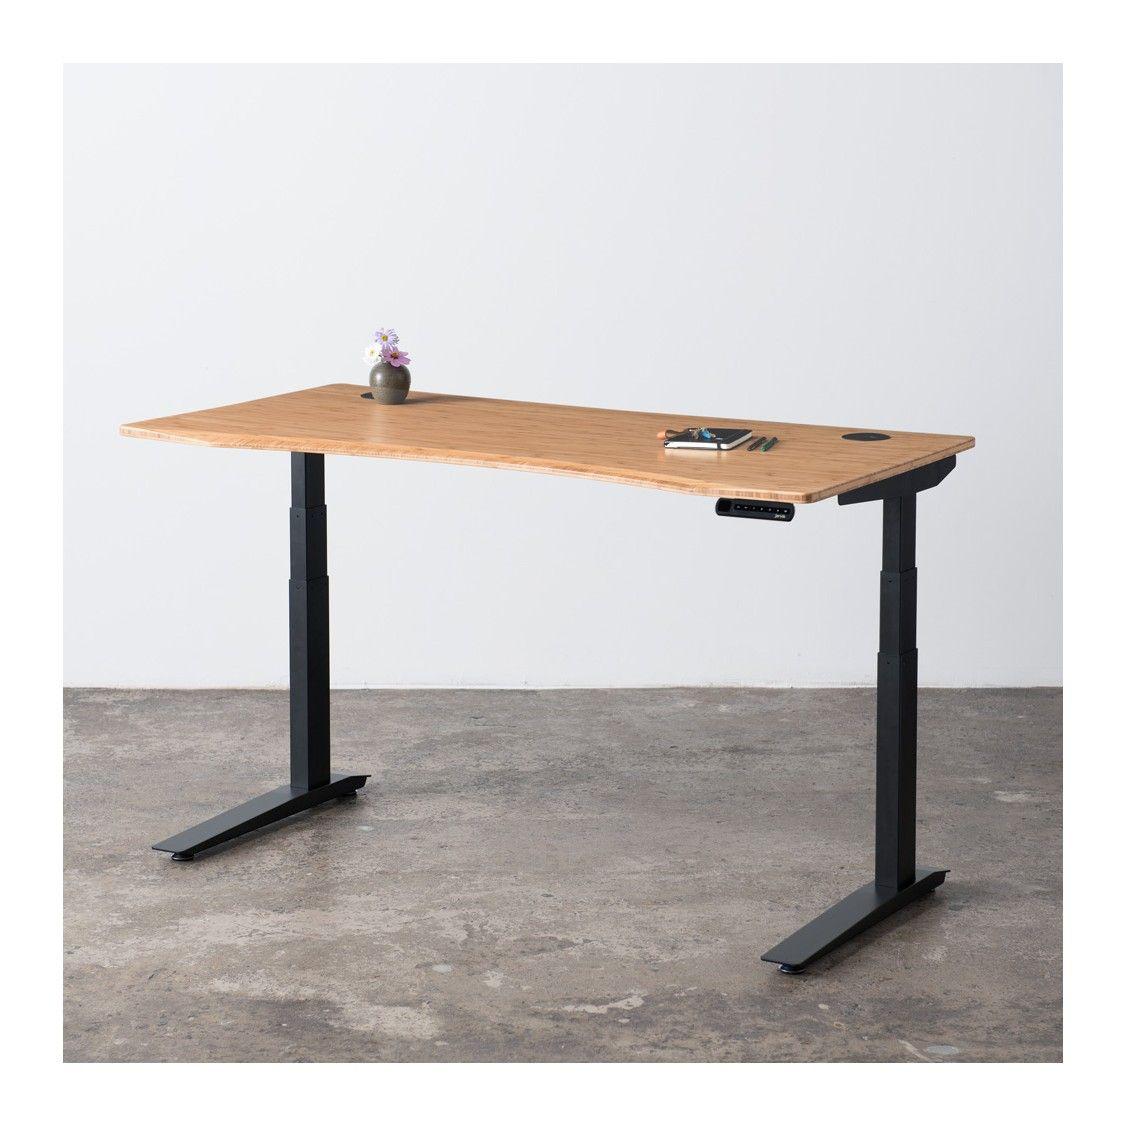 Jarvis Bamboo Adjustable Standing Desk Ergo Depot Standing Desk Frame Adjustable Height Standing Desk Standing Desk